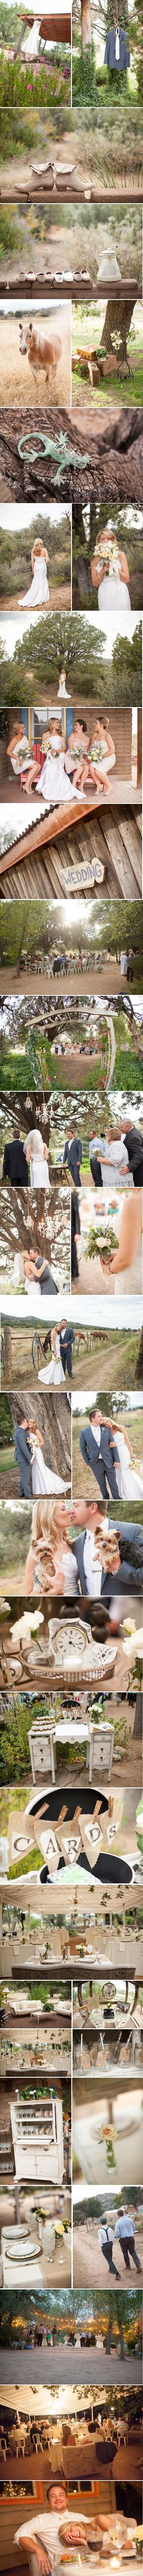 LOVE this rustic wedding! Photography by Verdi Sedona Arizona, Phoenix Arizona, Wedding Dreams, Dream Wedding, Ranch Weddings, From Miss To Mrs, Nice Ideas, Rustic Outdoor, Long Island